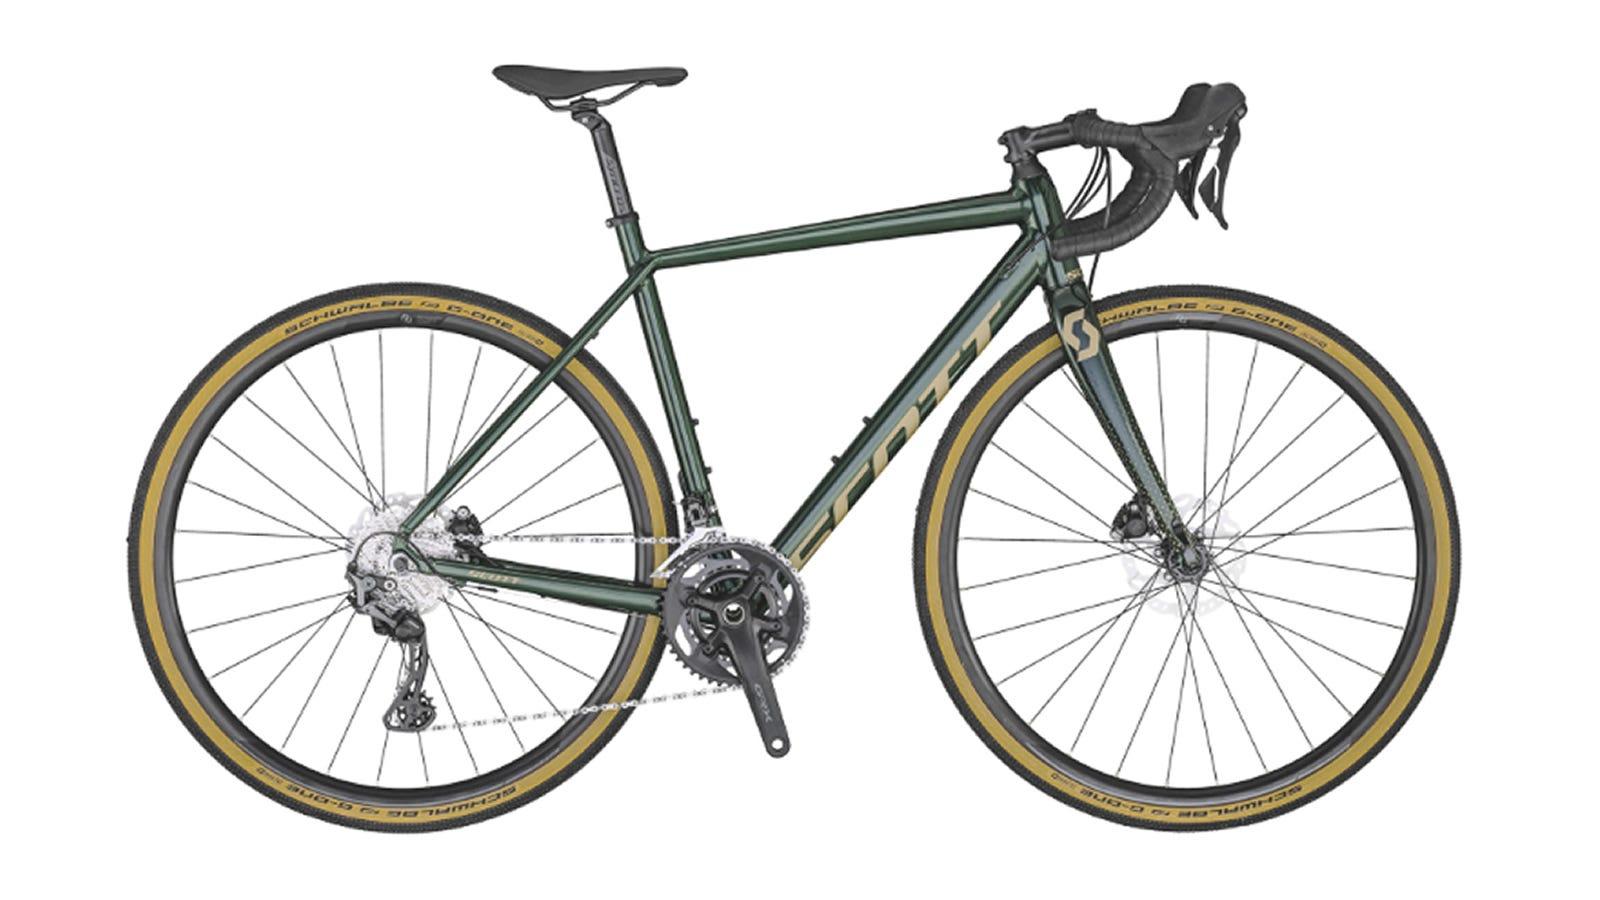 The Scott Contessa Speedster Gravel 15 Bike.